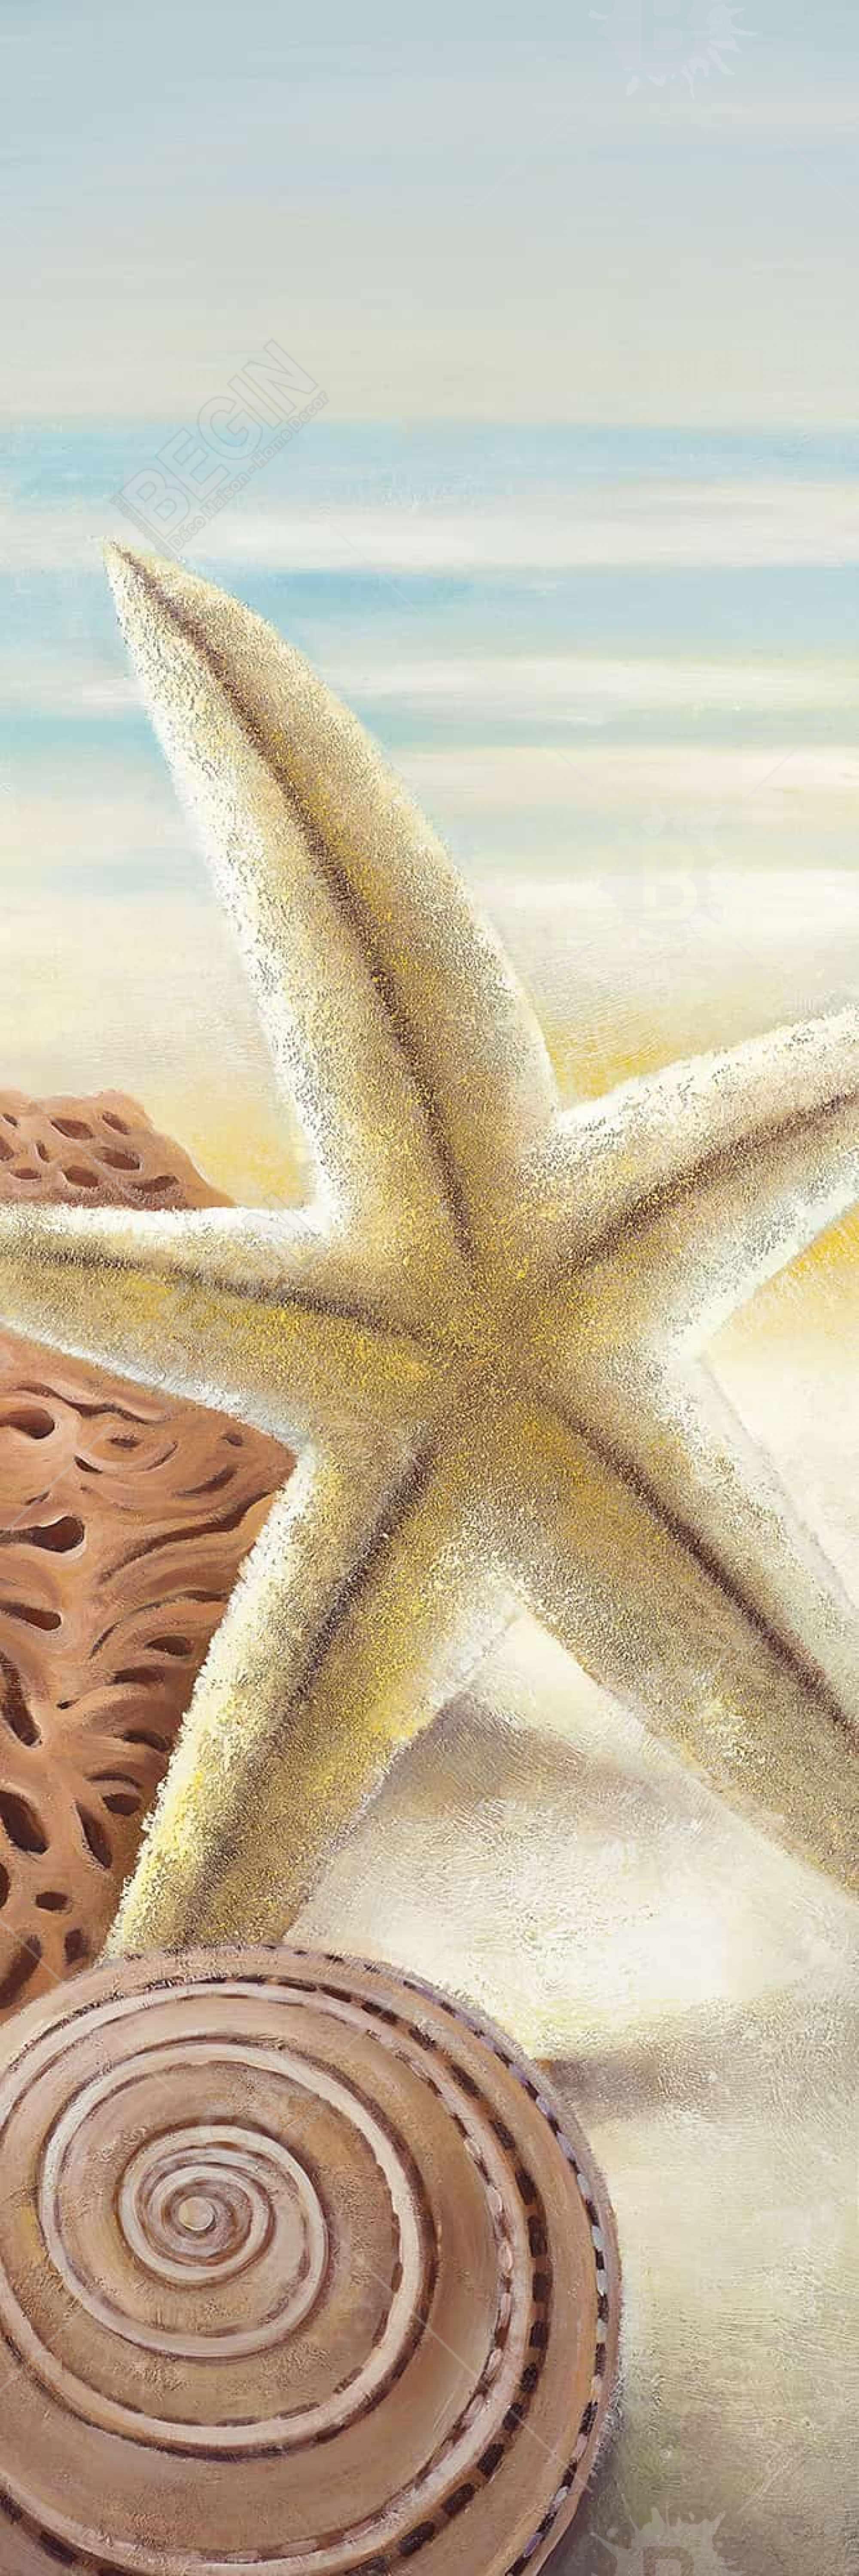 Starfish and seashells at the beach